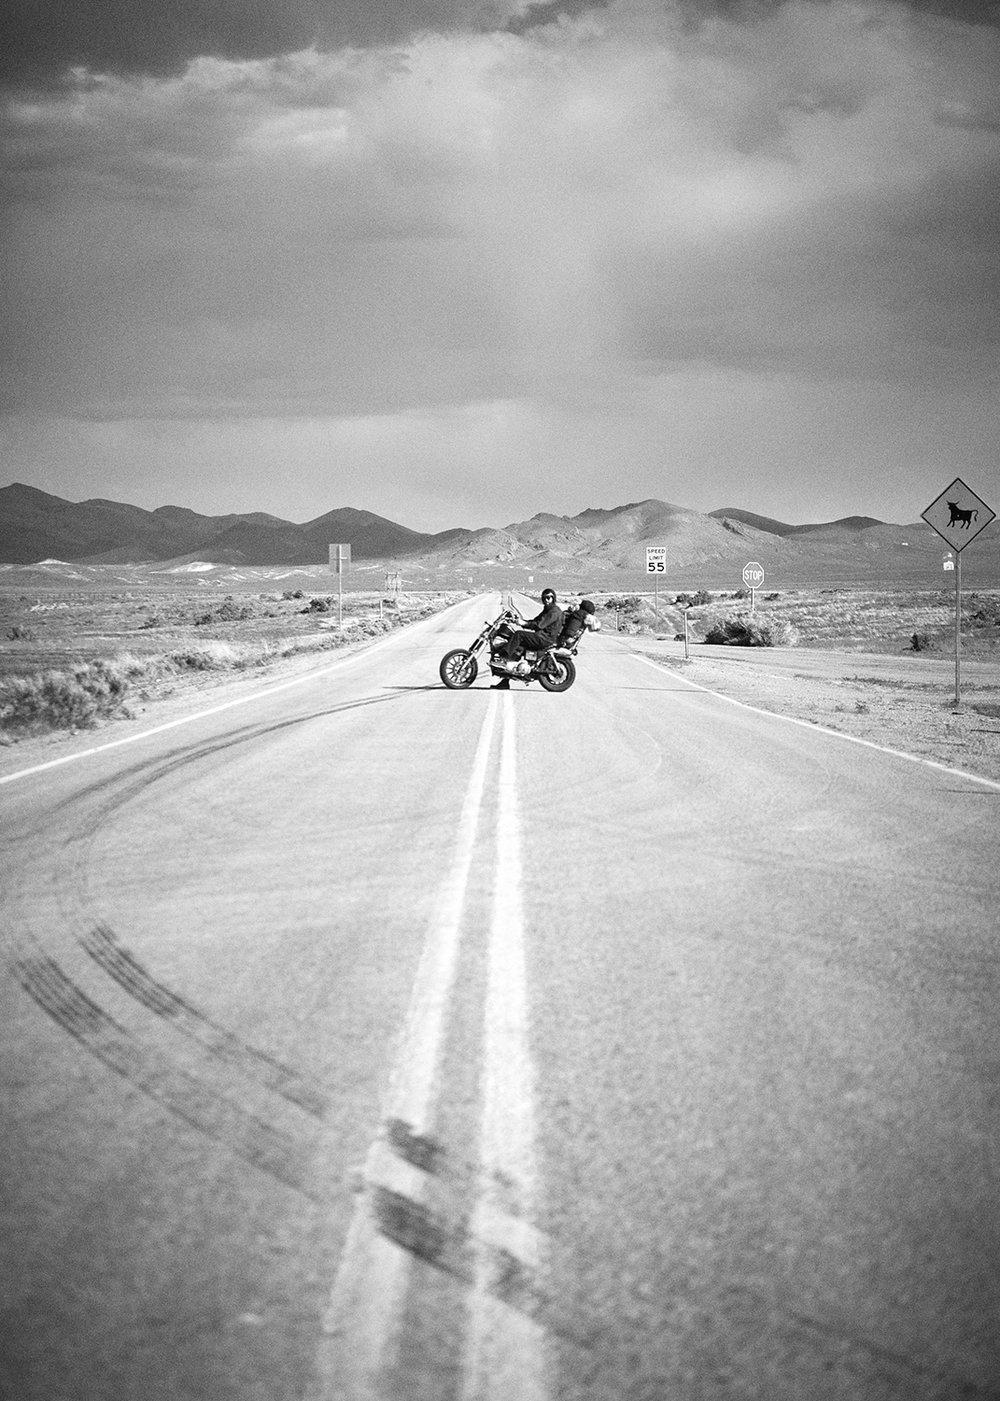 Rob_Williamson_robistall_motorcycles_25.jpg